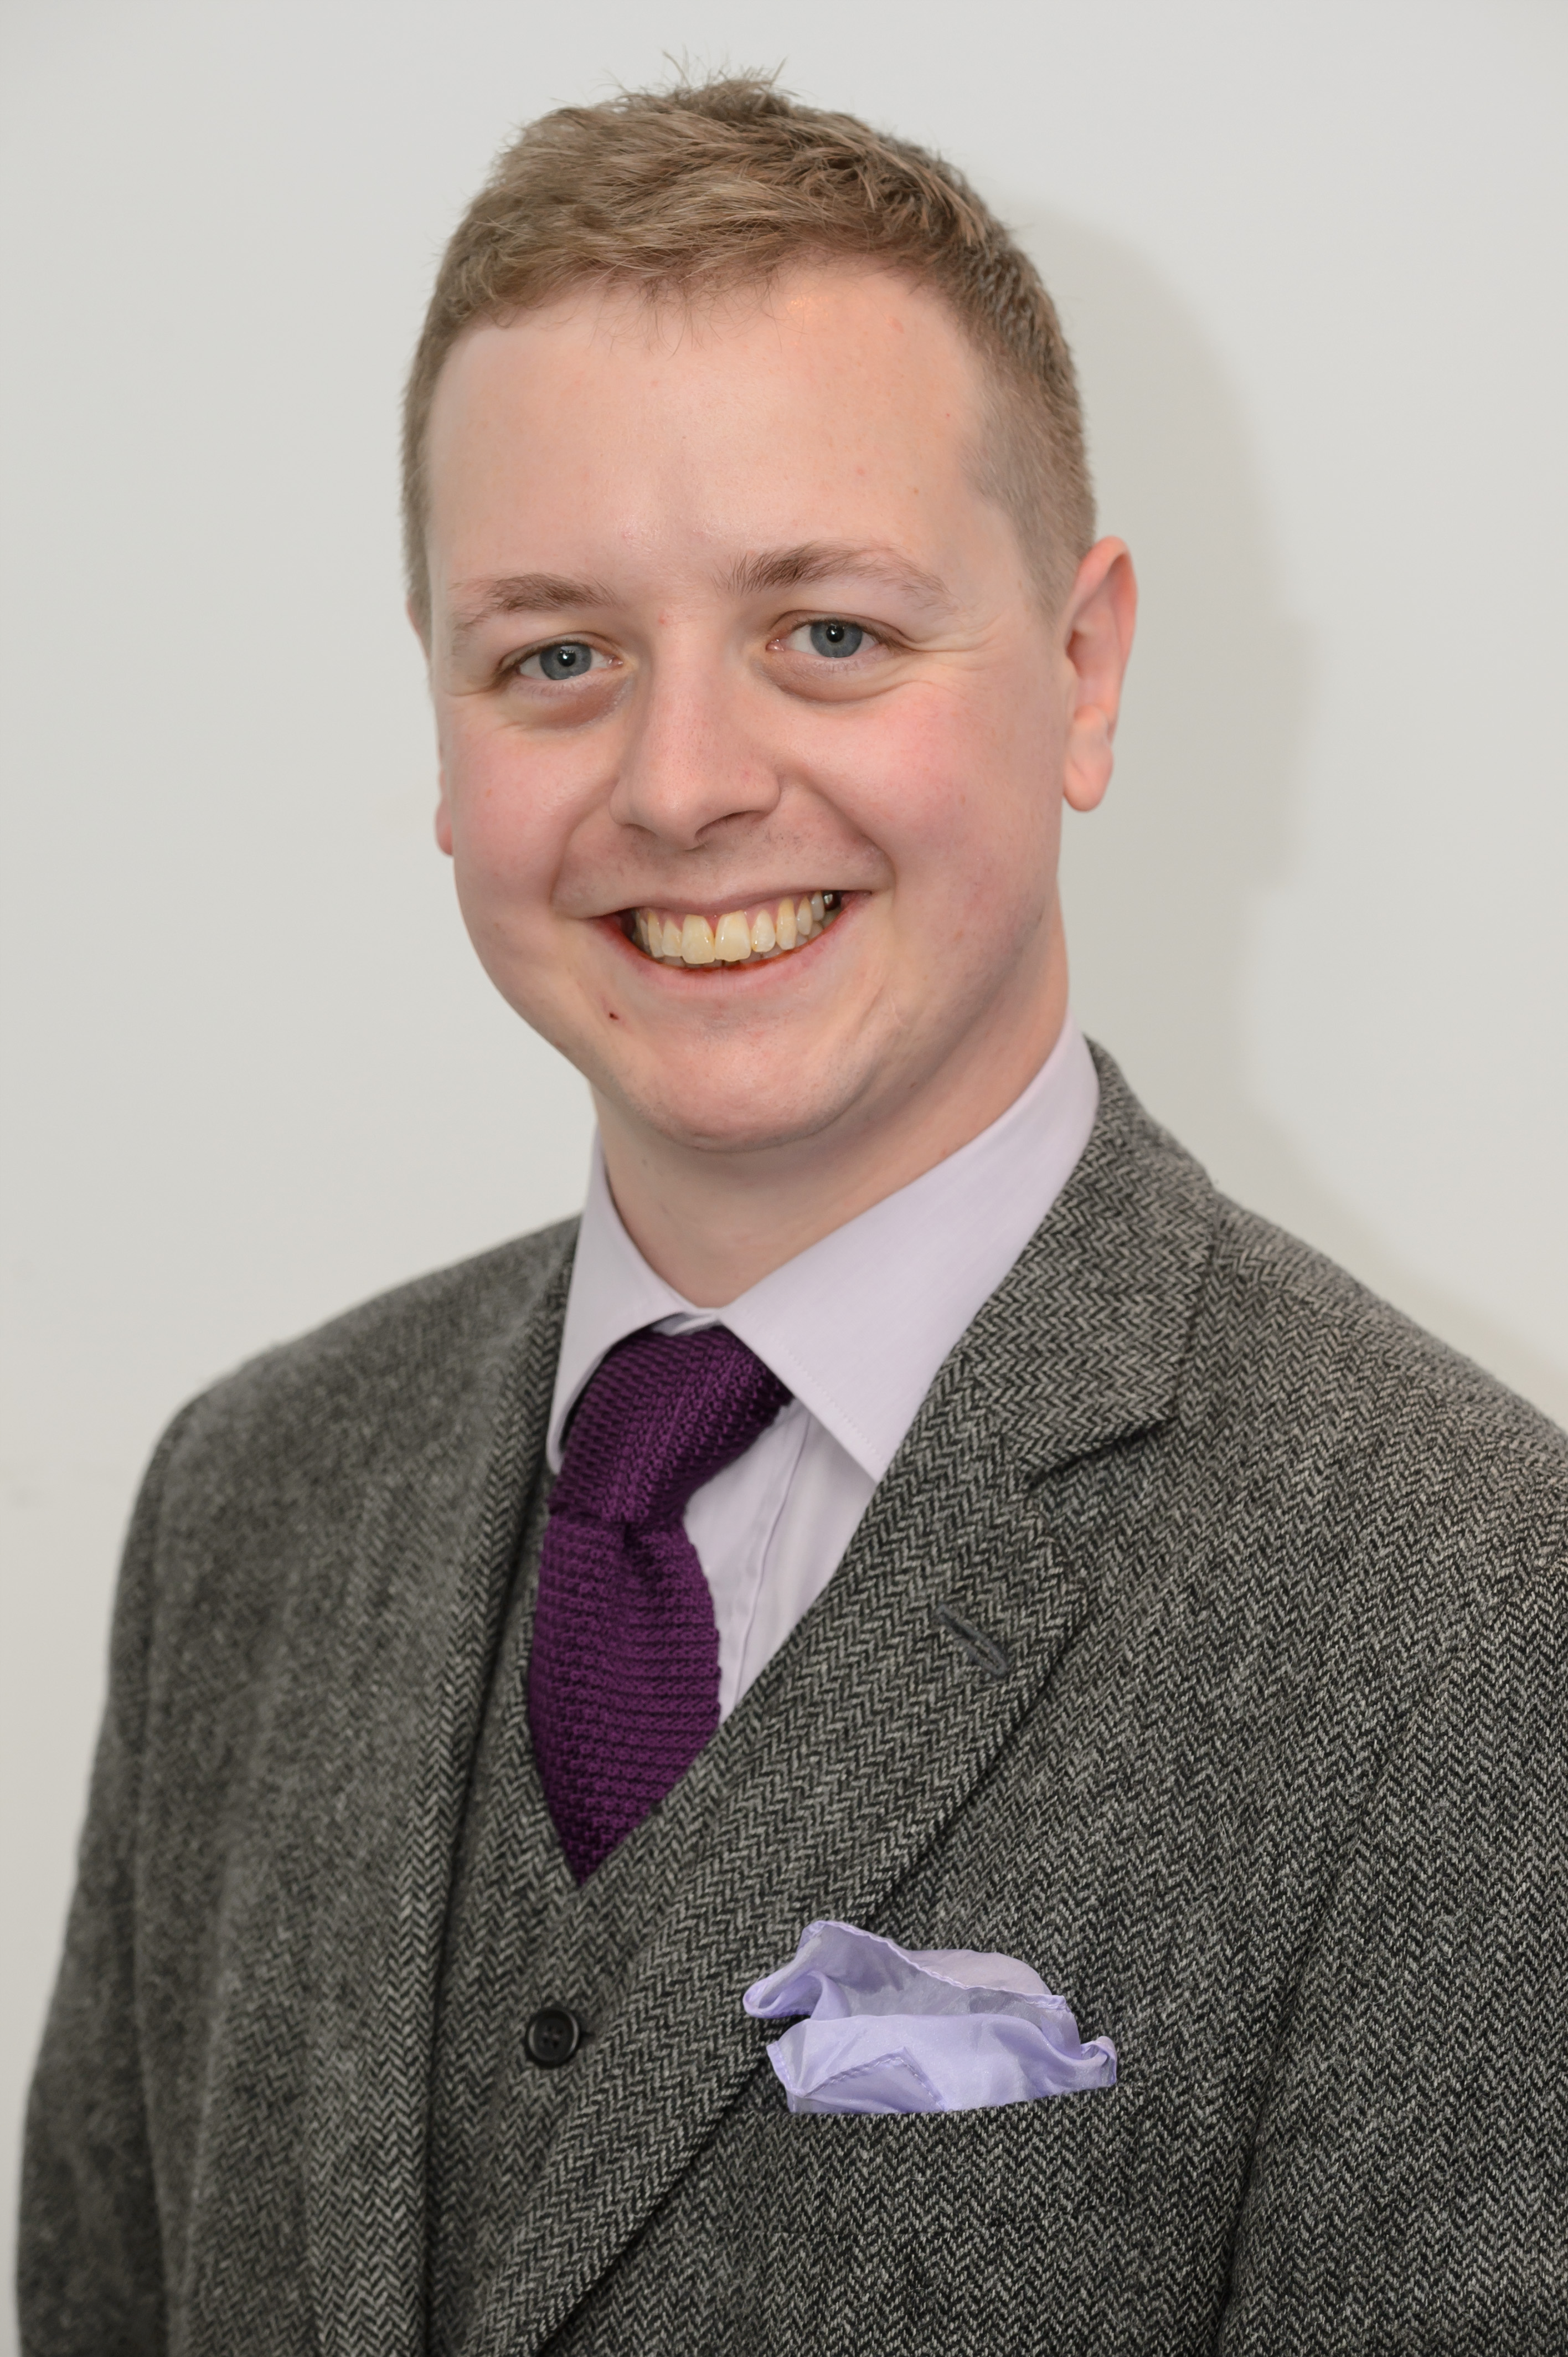 Michael Gumn - Head of Hub Information Services